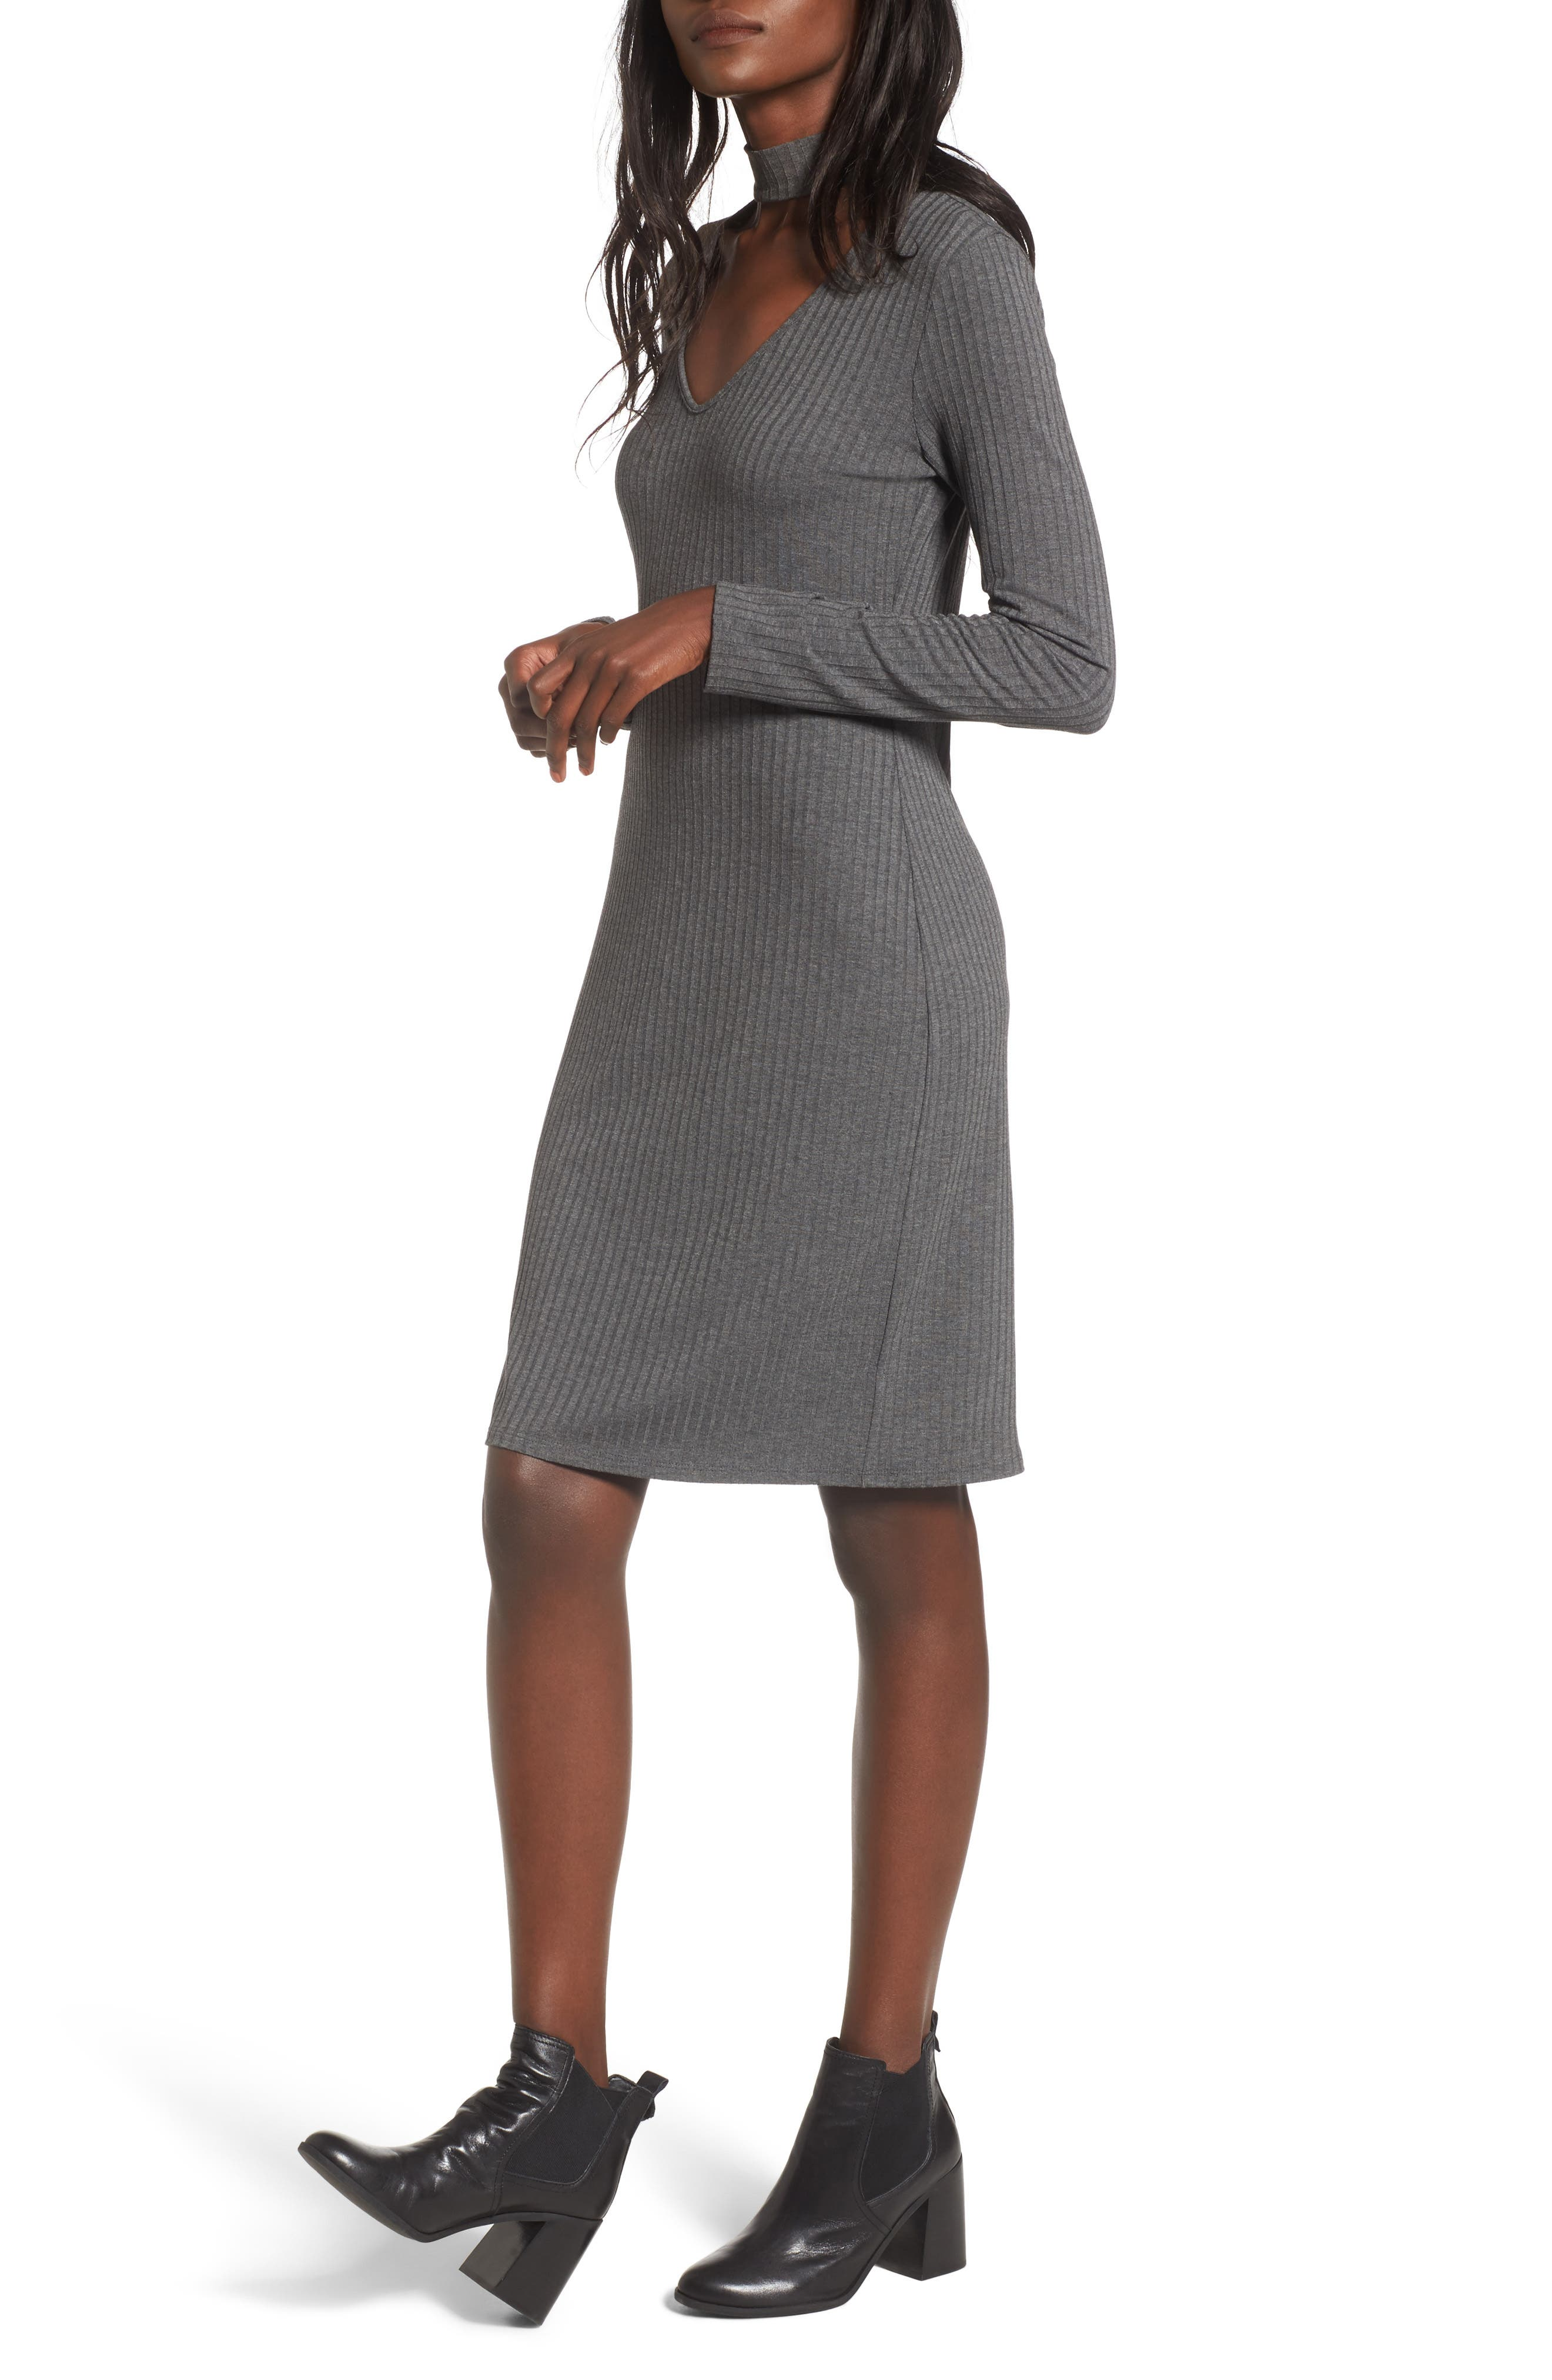 One Clothing Ribbed Choker Dress